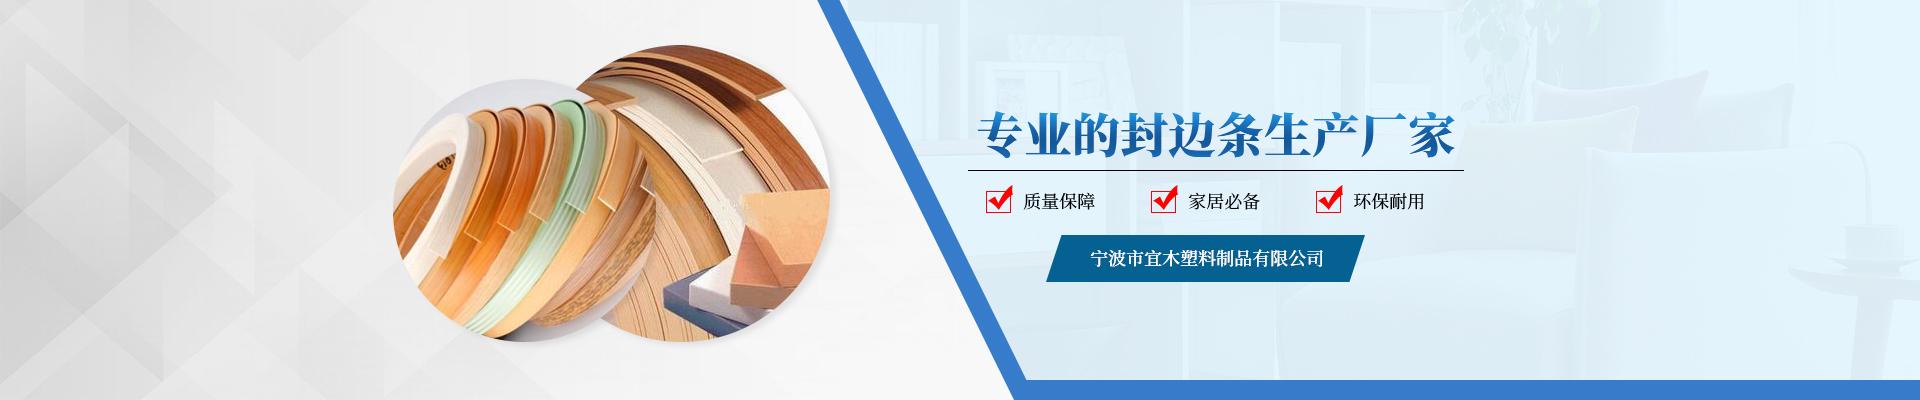 http://www.nbyimu.cn/data/upload/202008/20200803161403_982.jpg